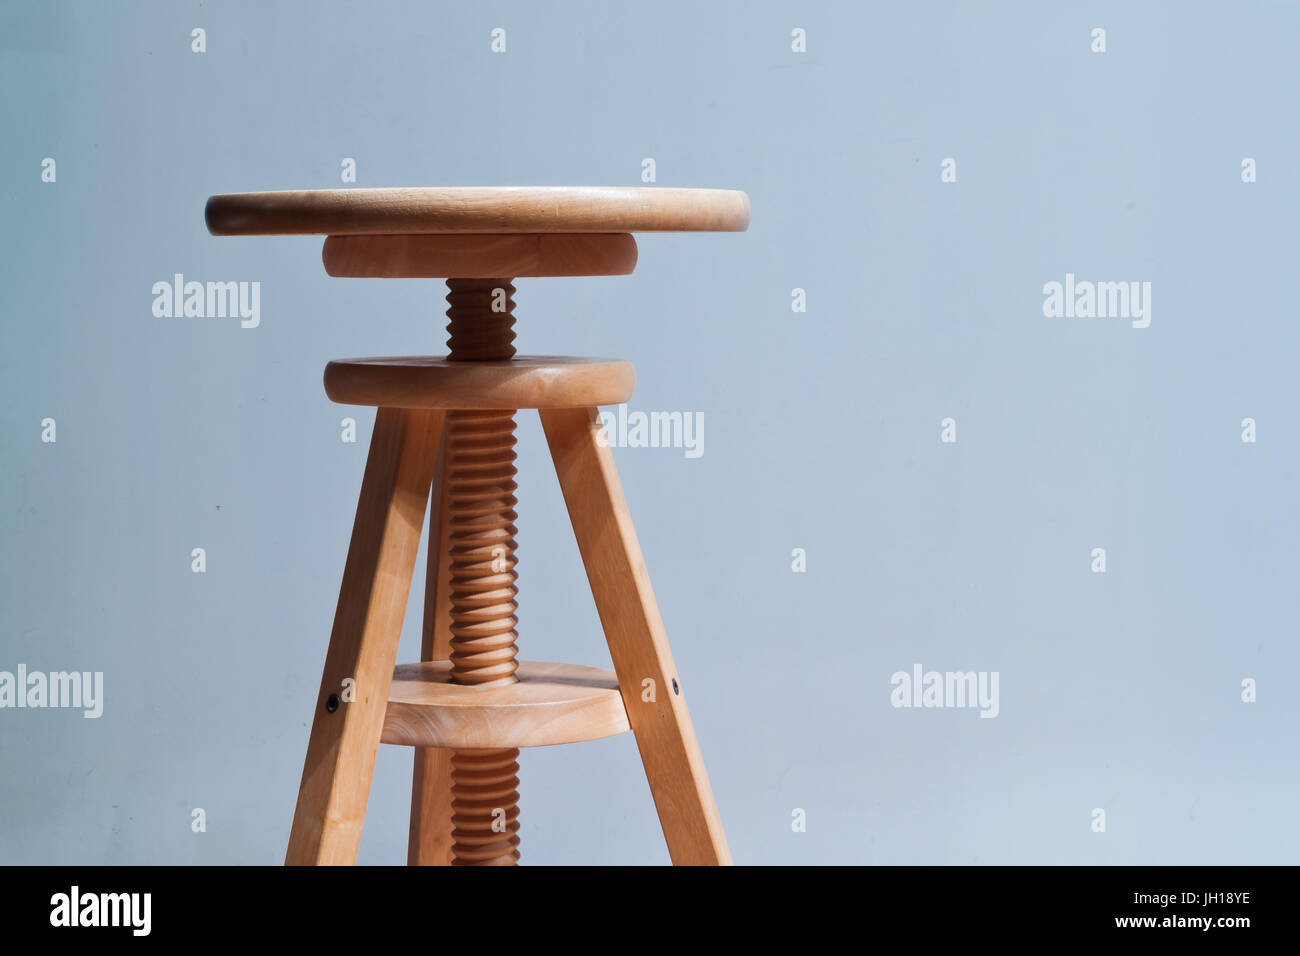 Sgabello immagini & sgabello fotos stock alamy